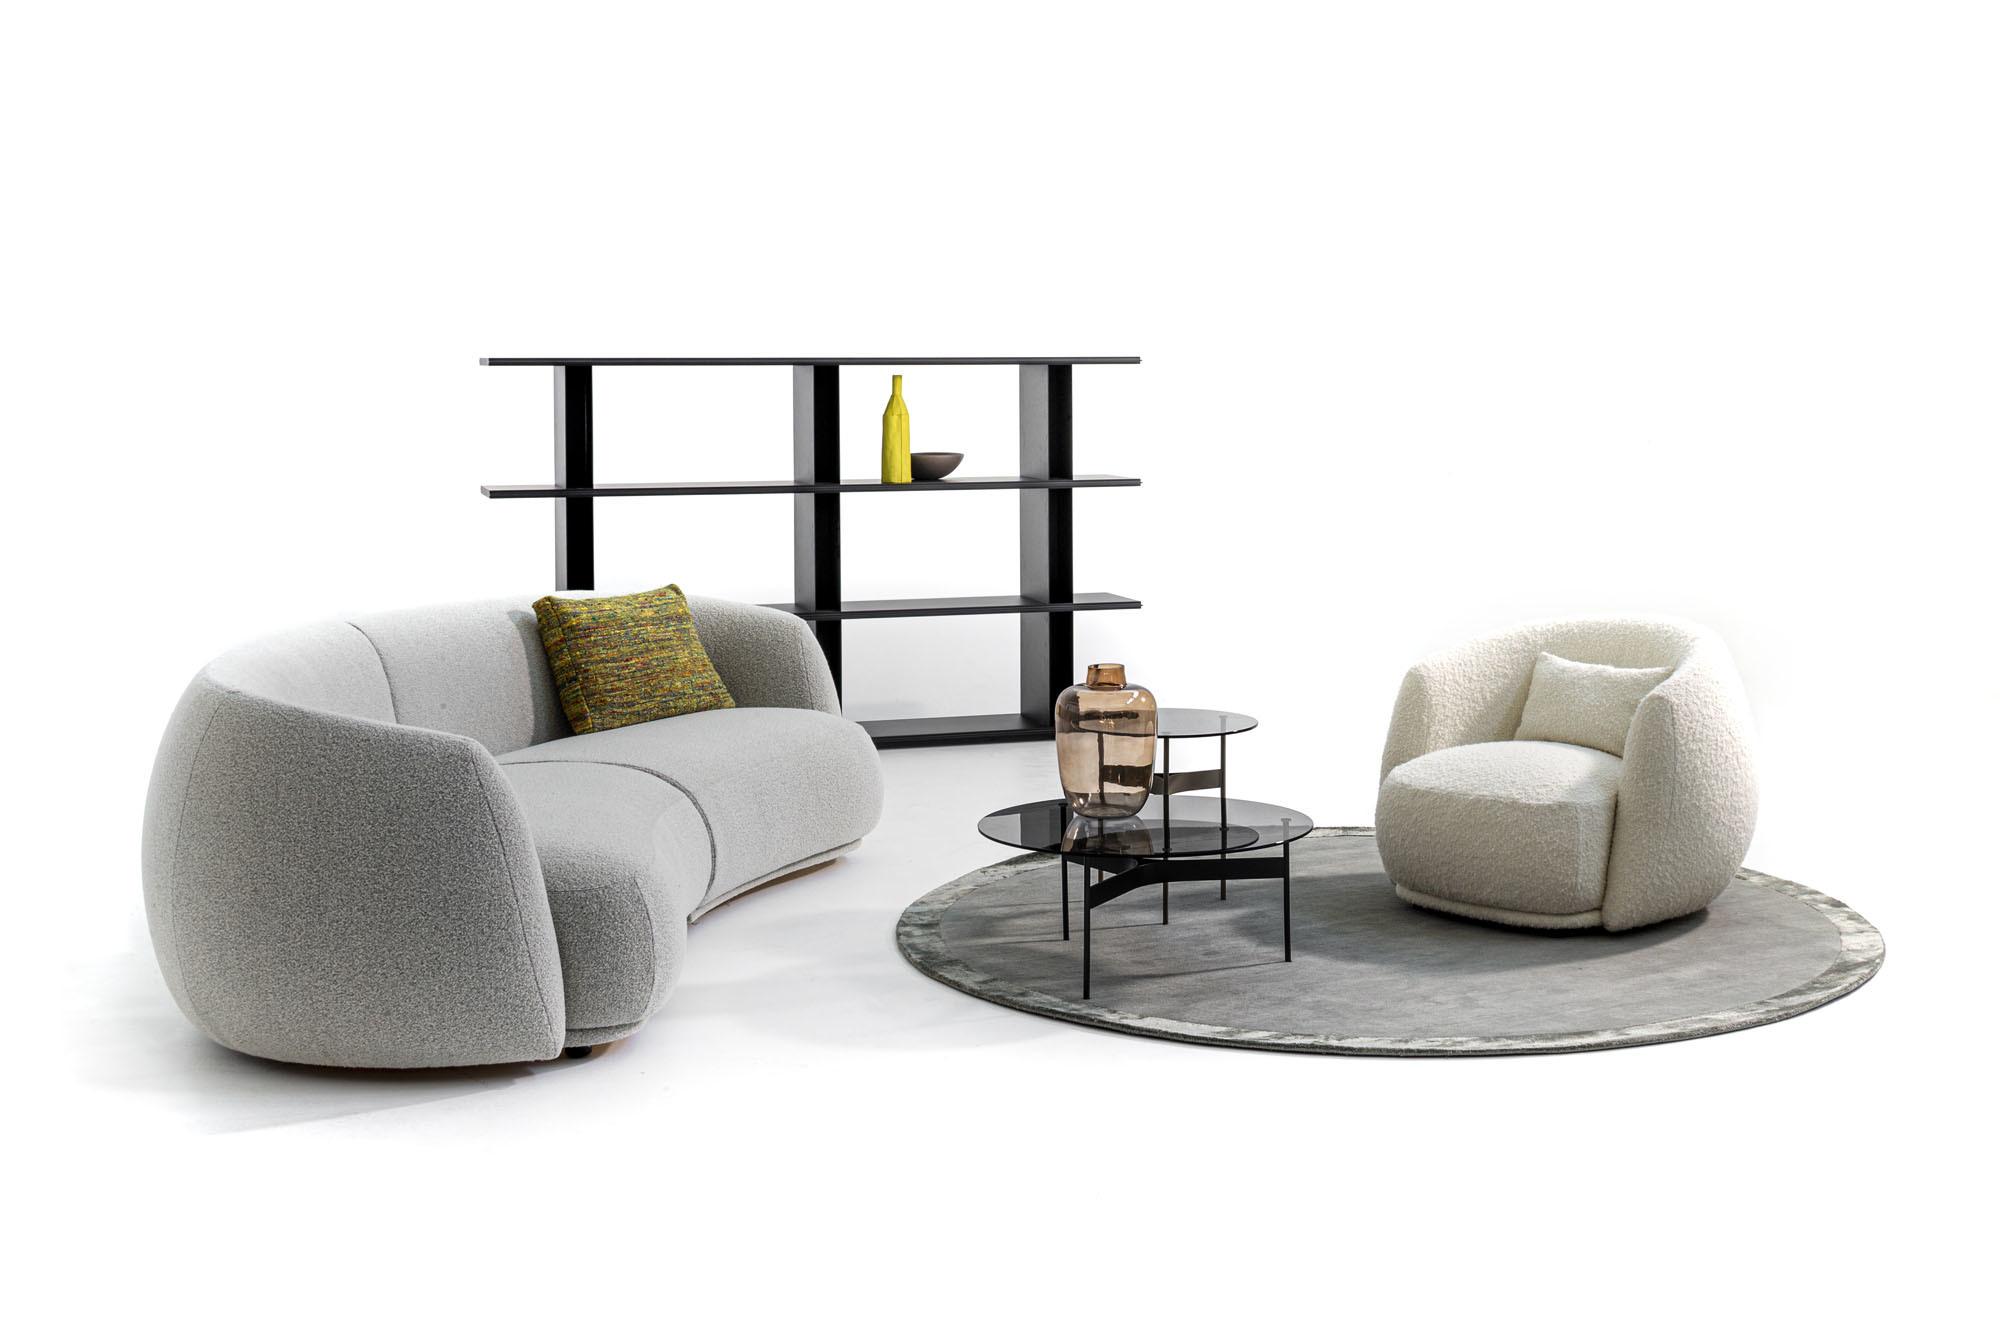 SofaPacific mit passendem Sessel von Patricia Urquiola für Moroso. Foto:Alessandro Paderni